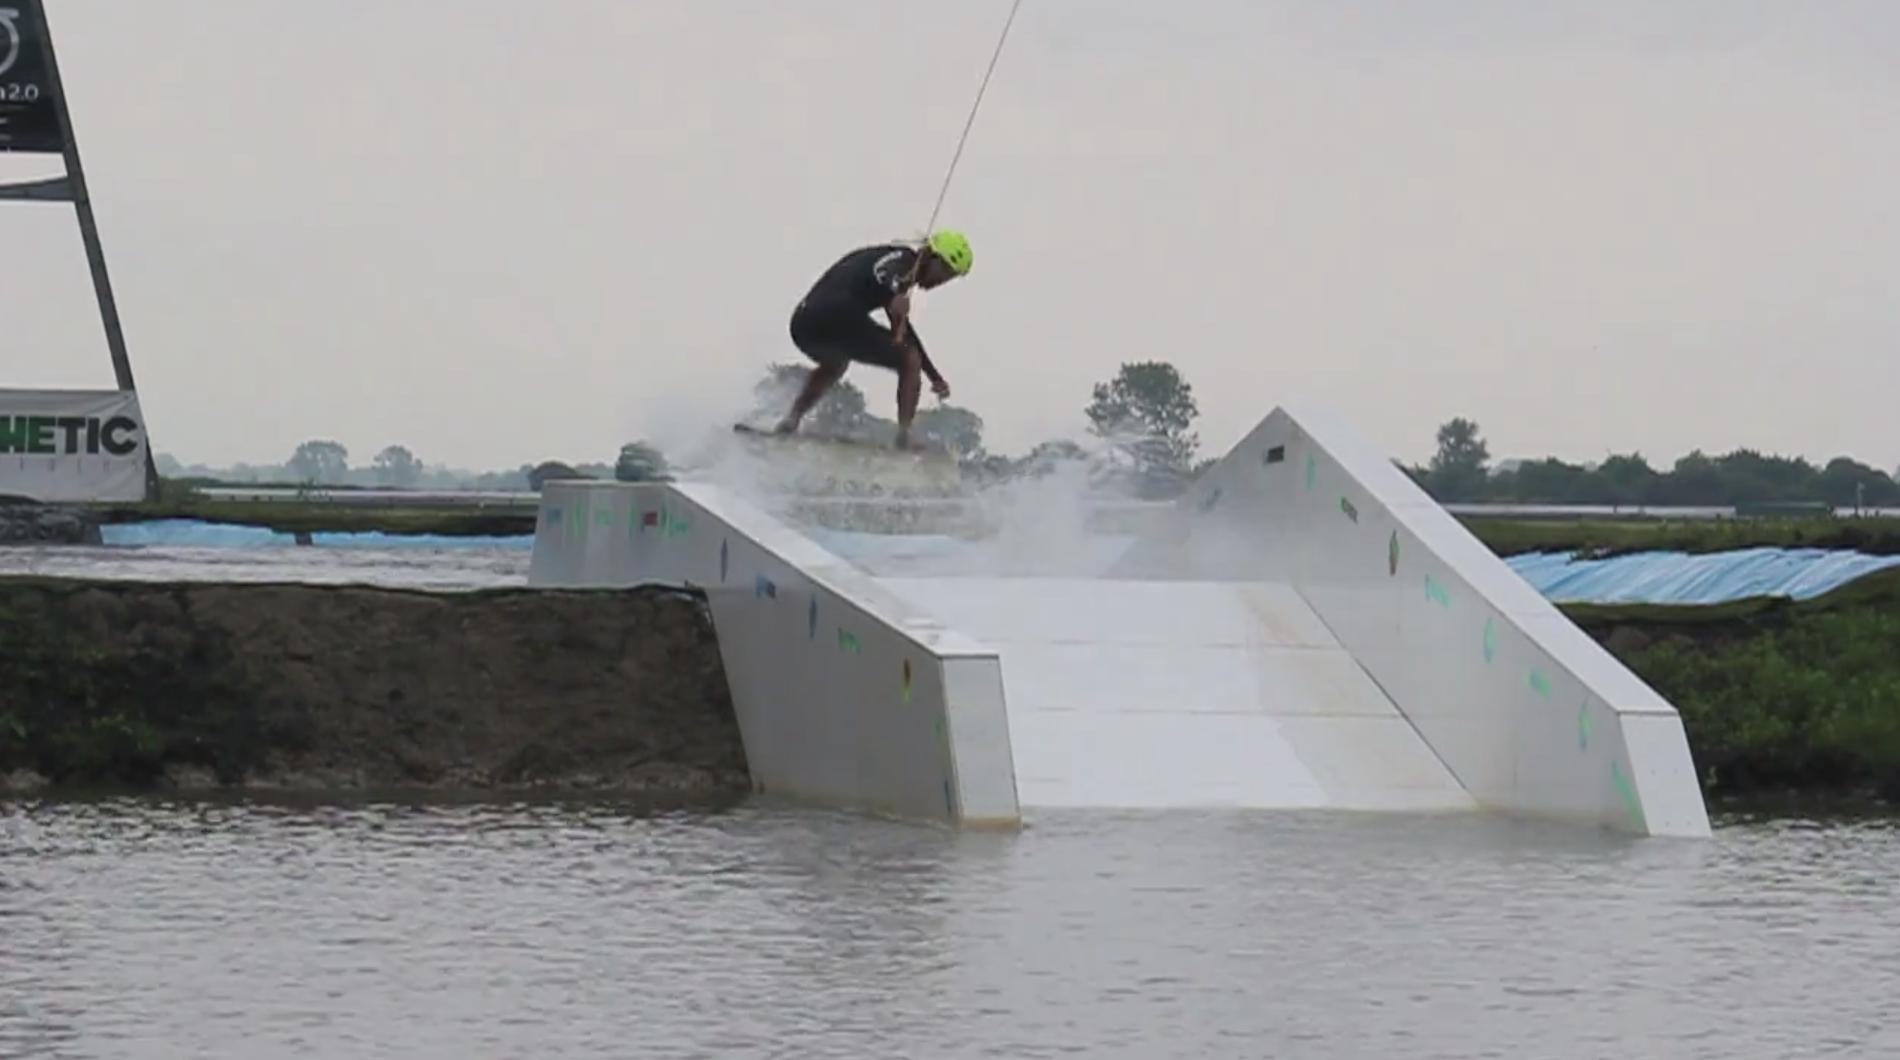 Hannams Wake Hub: Pool Gap with Ollie Moore